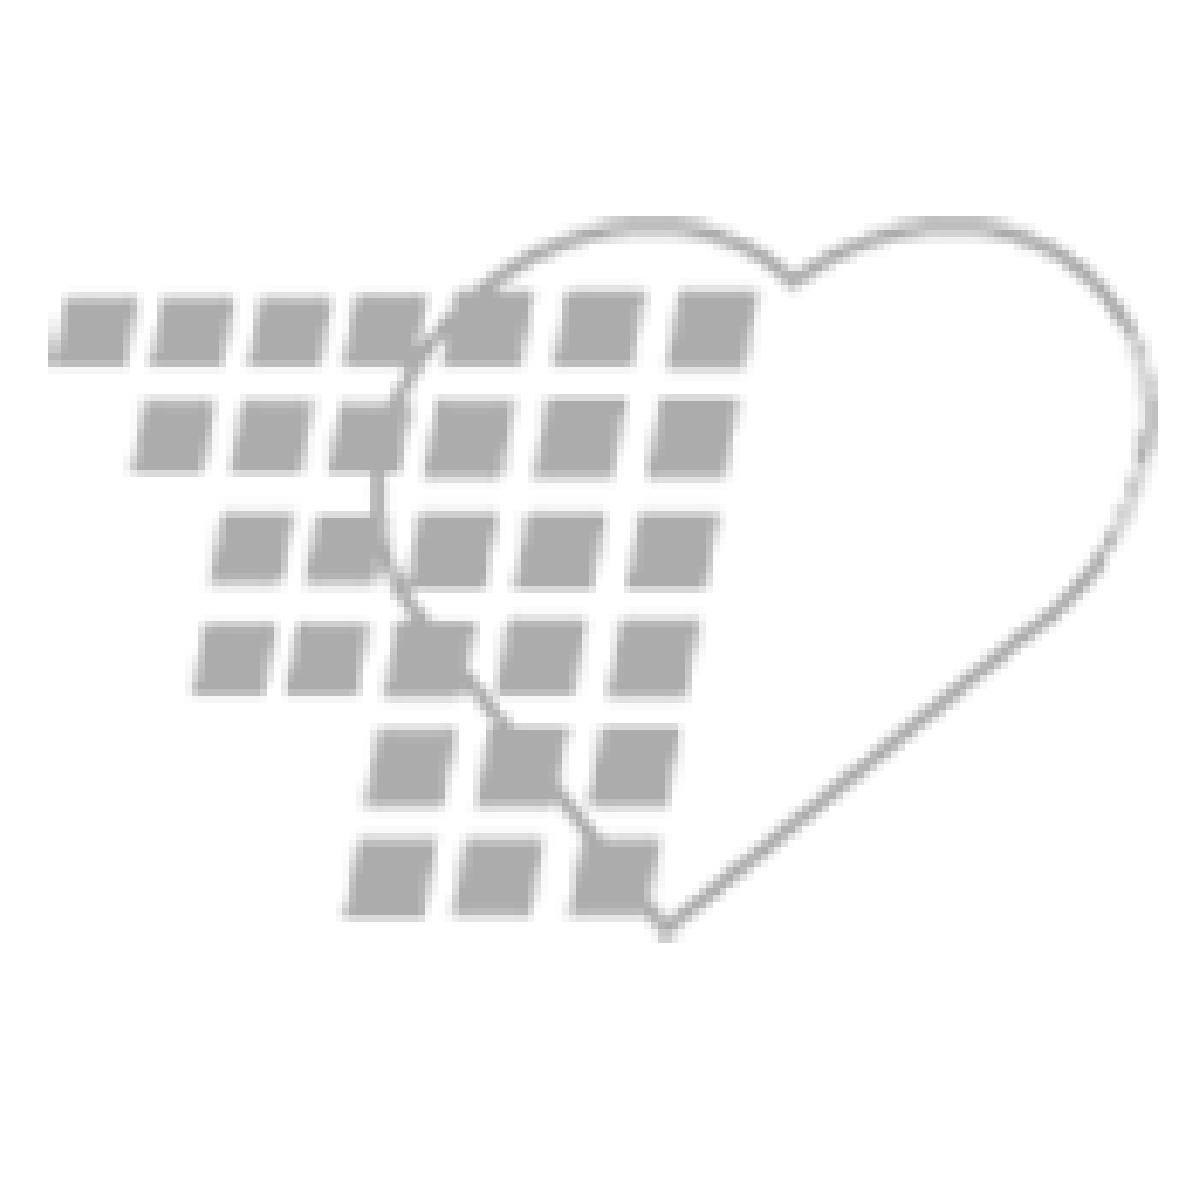 06-21-4902 BD™ Luer-Lok™ Access Device